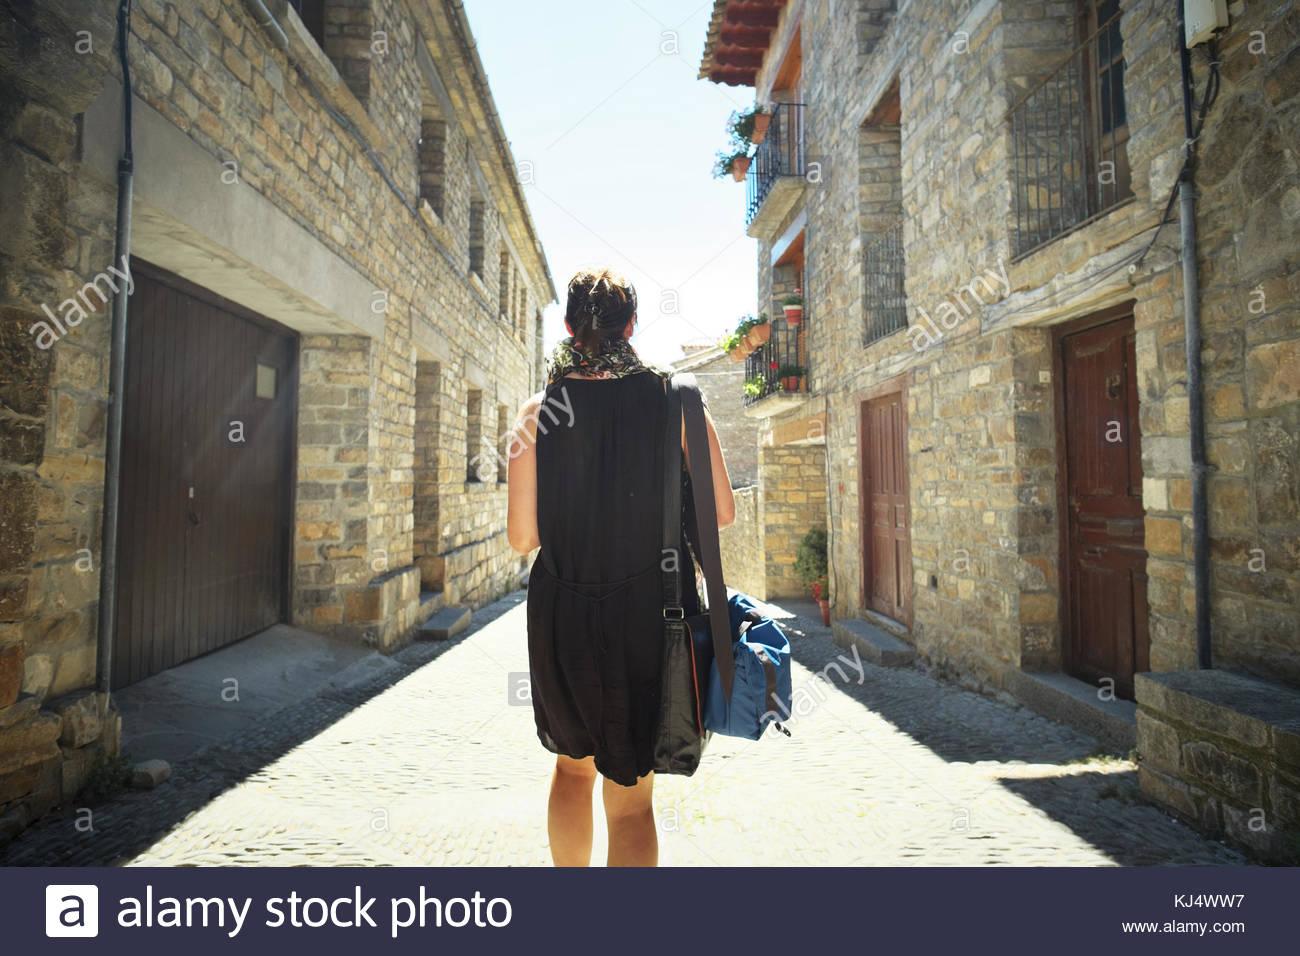 Frau wandern in leere Straße Stockbild